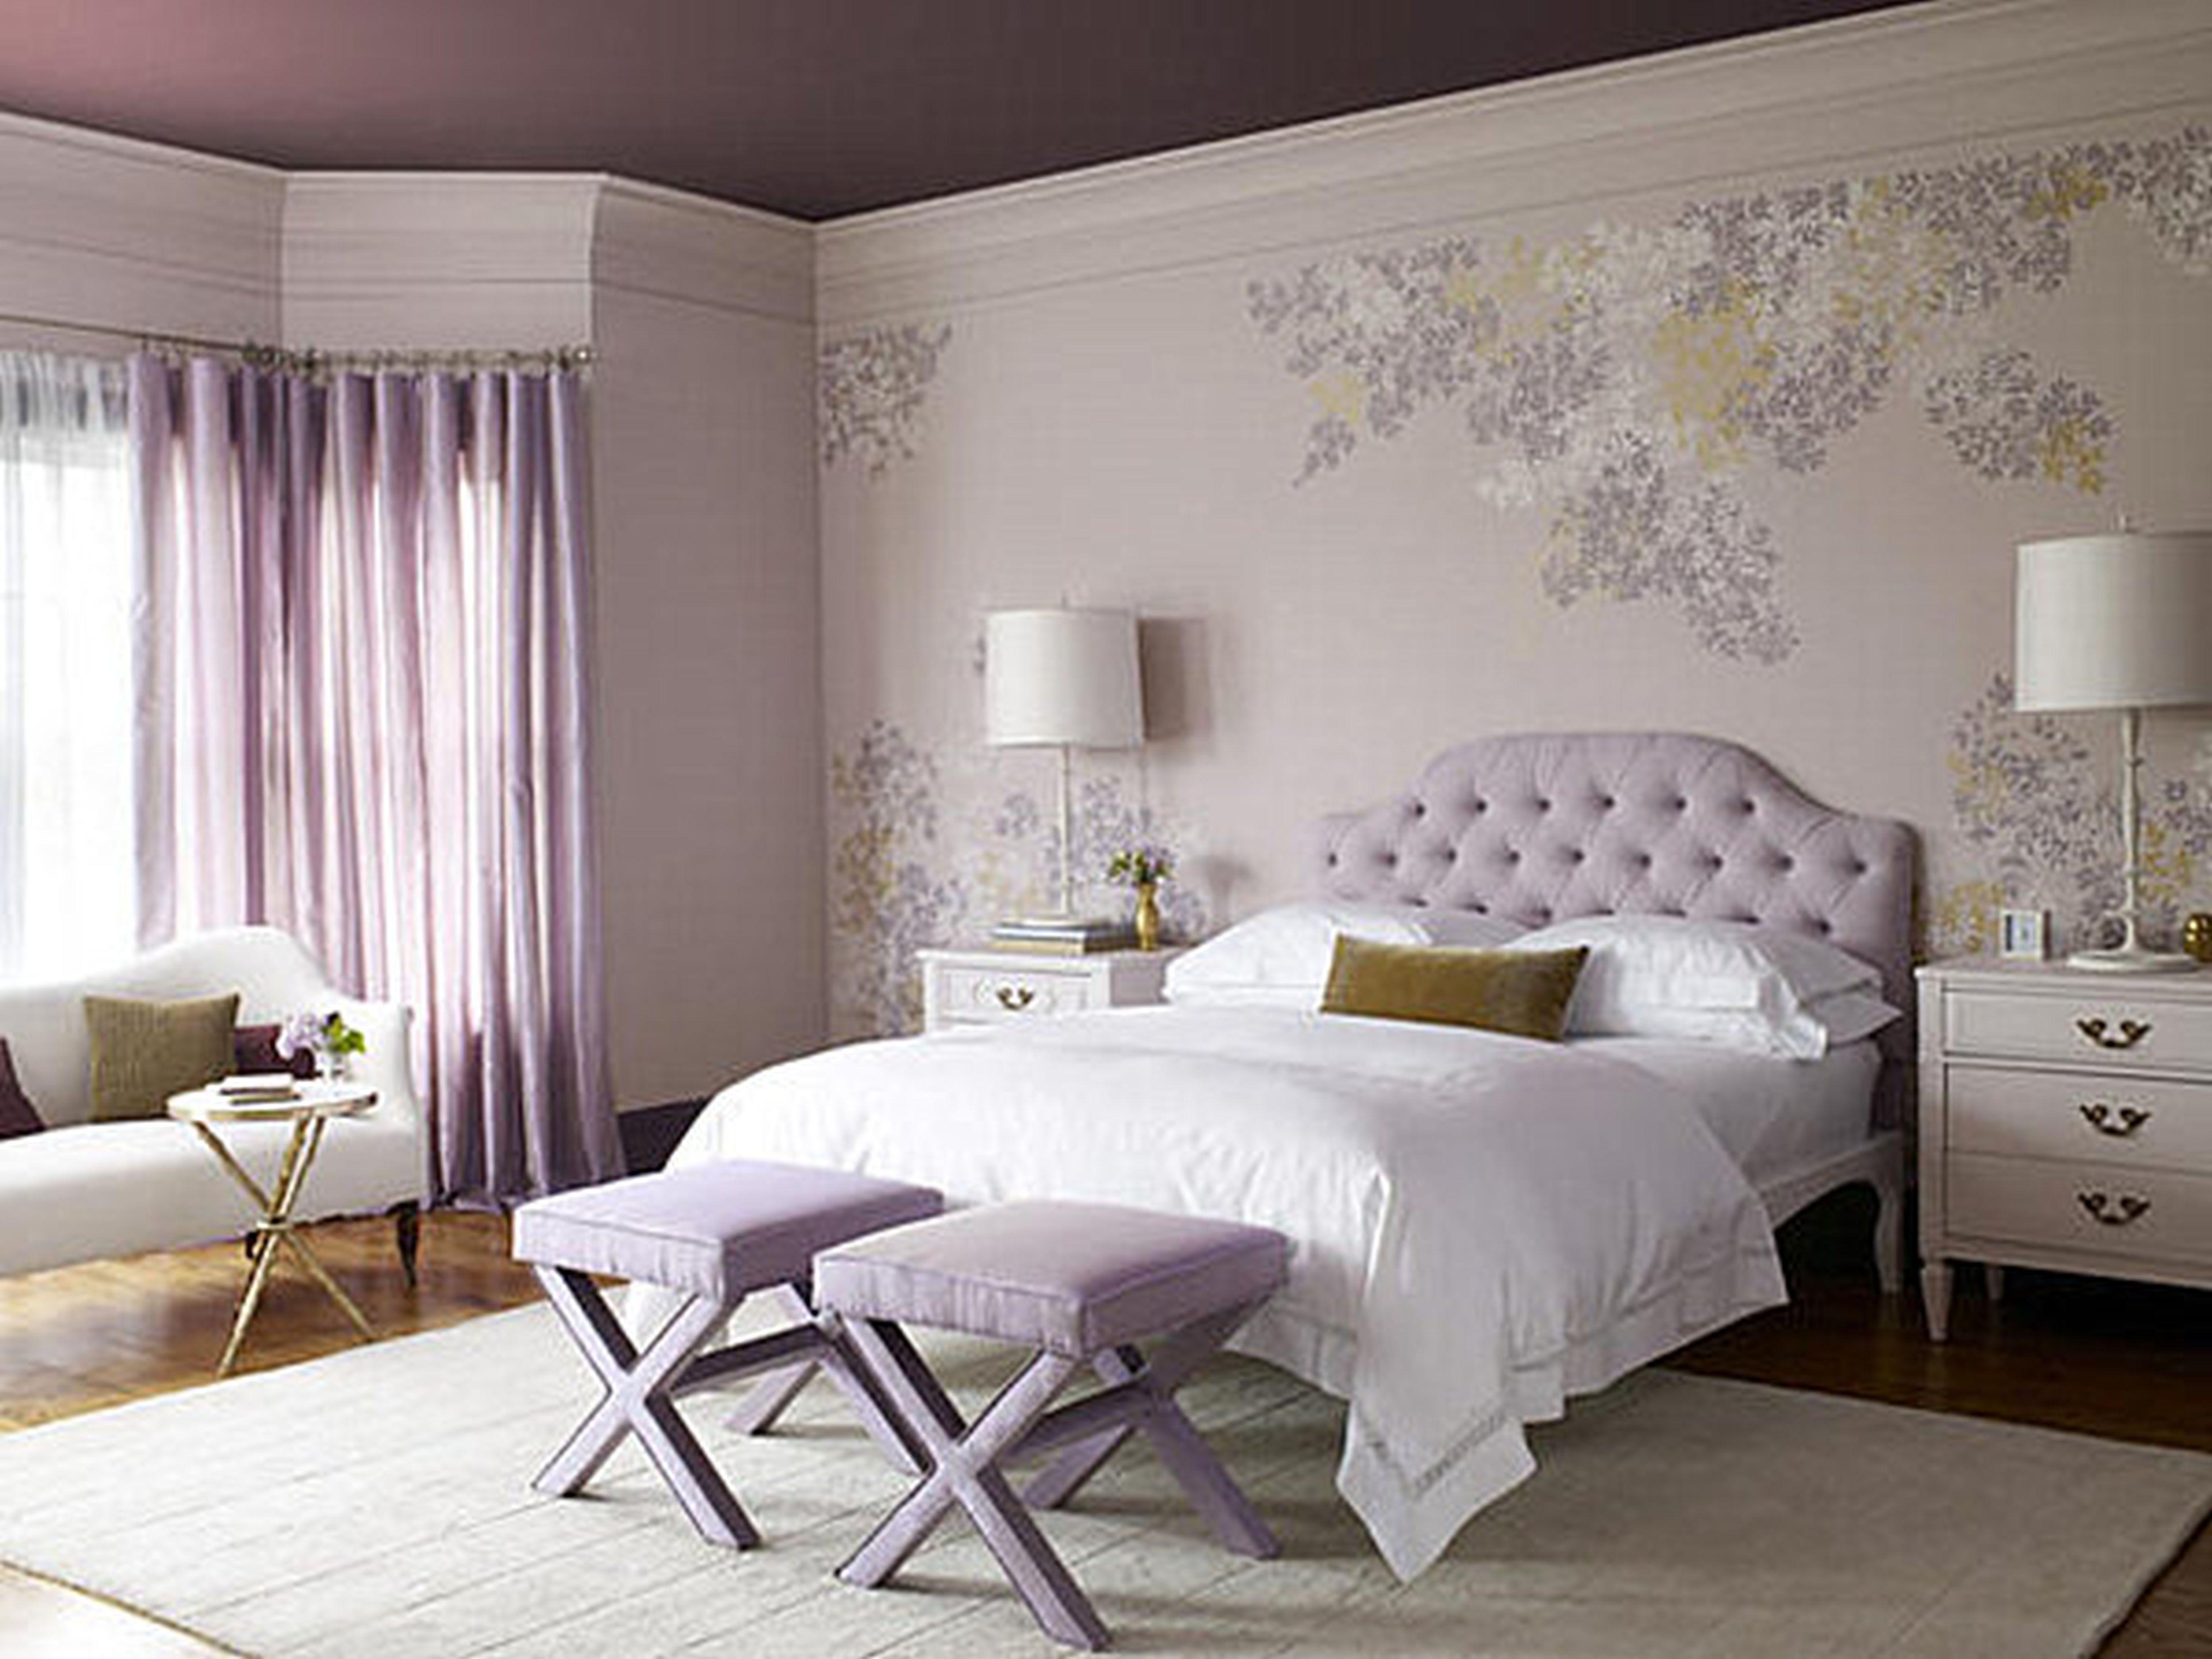 wallpaper designs for bedrooms ideas wallpaper designs for bedrooms